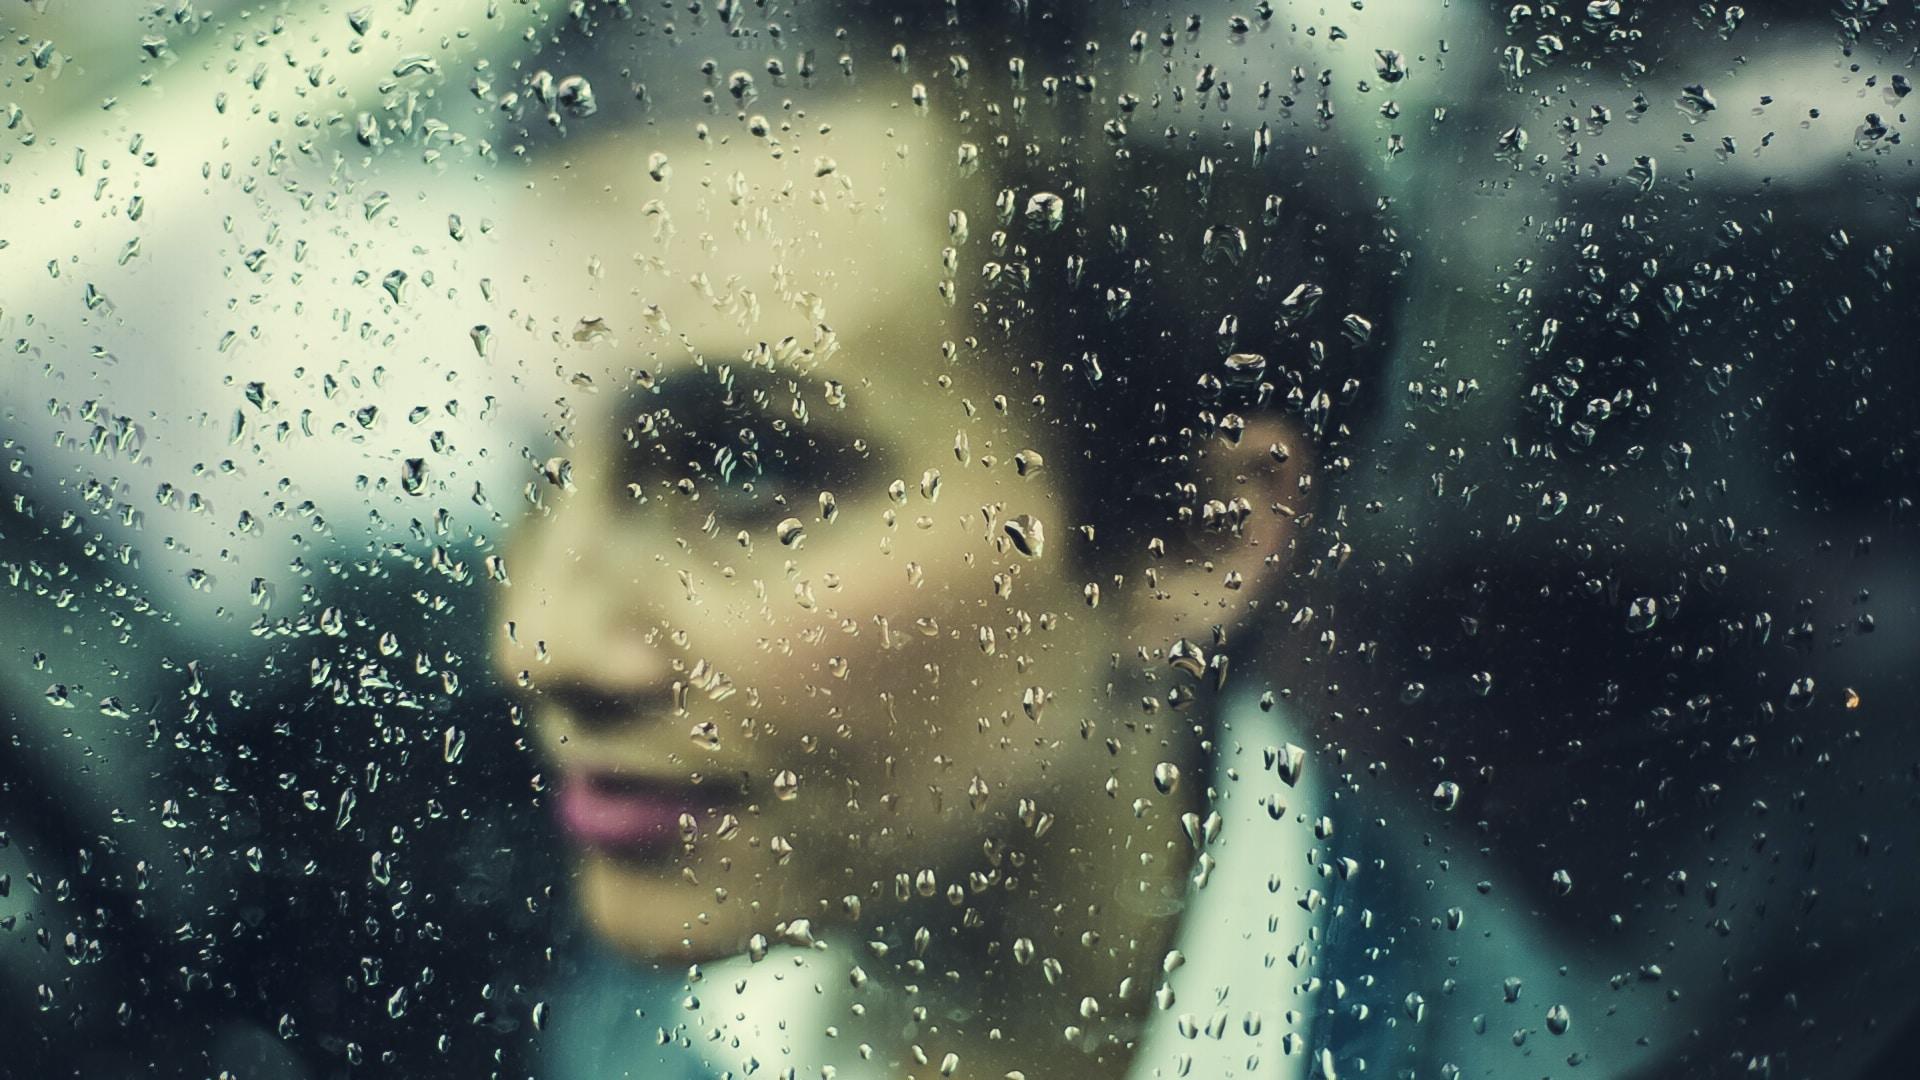 A woman's face seen through a rain-streaked window